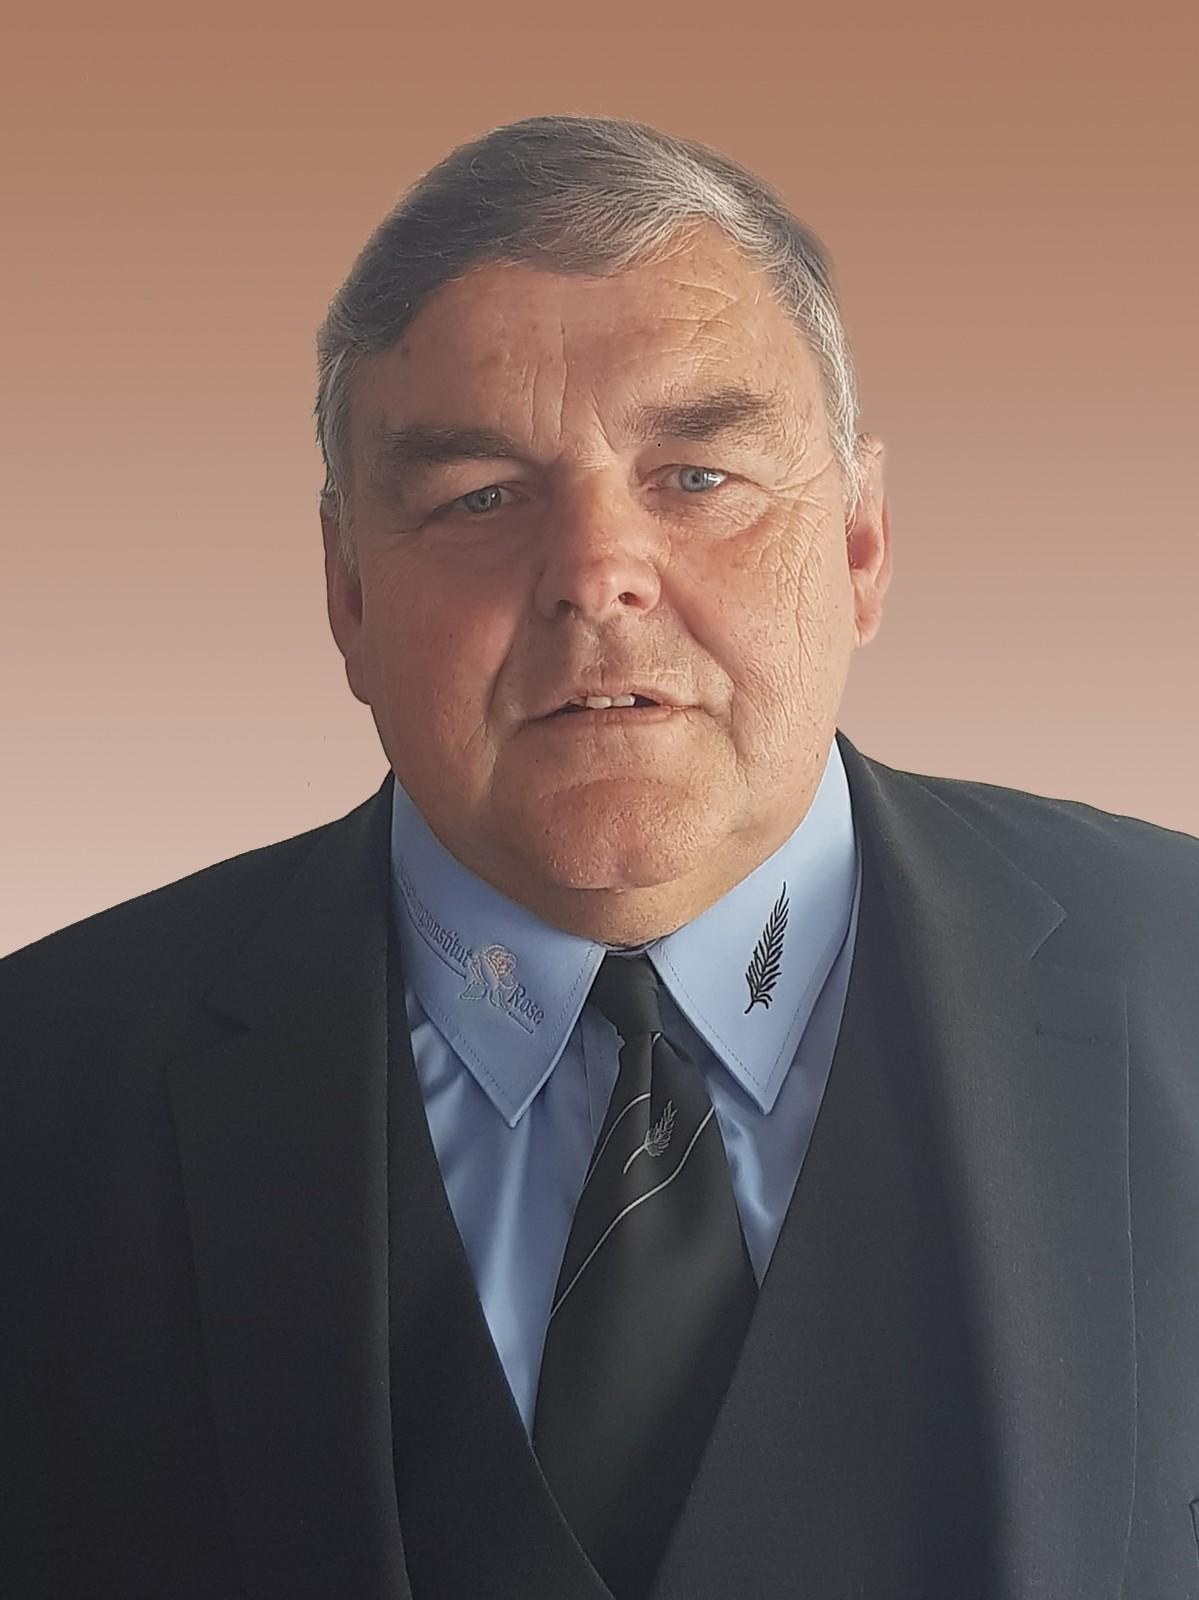 Klaus Stoß